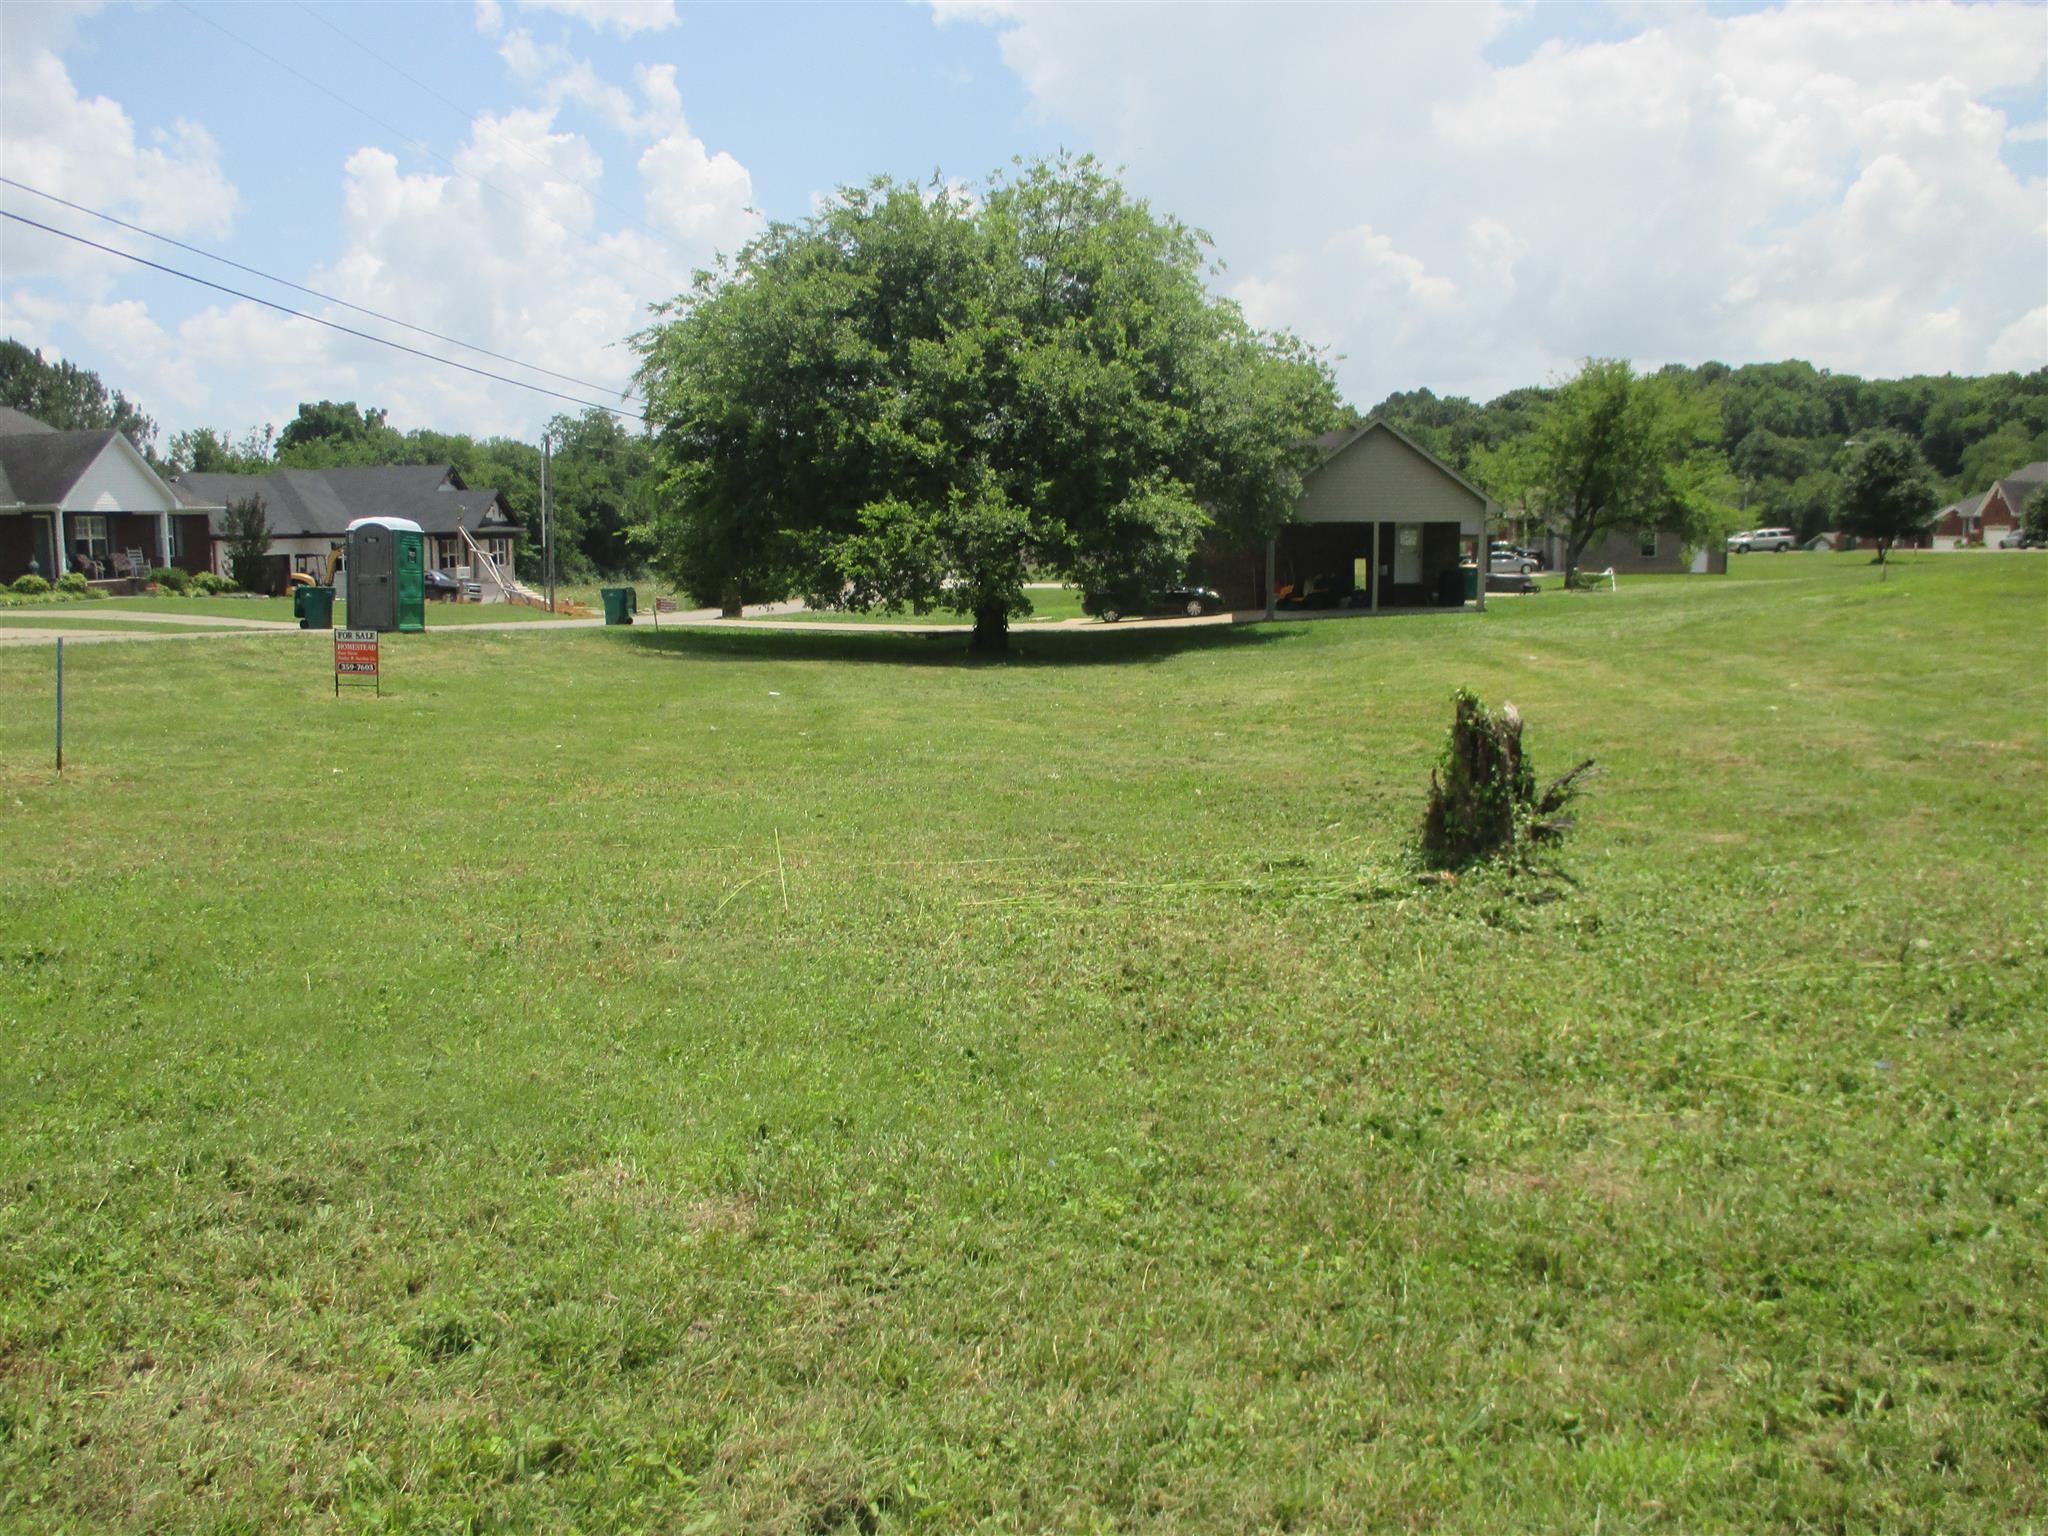 1006 Corey Dr, Lewisburg, TN 37091 - Lewisburg, TN real estate listing